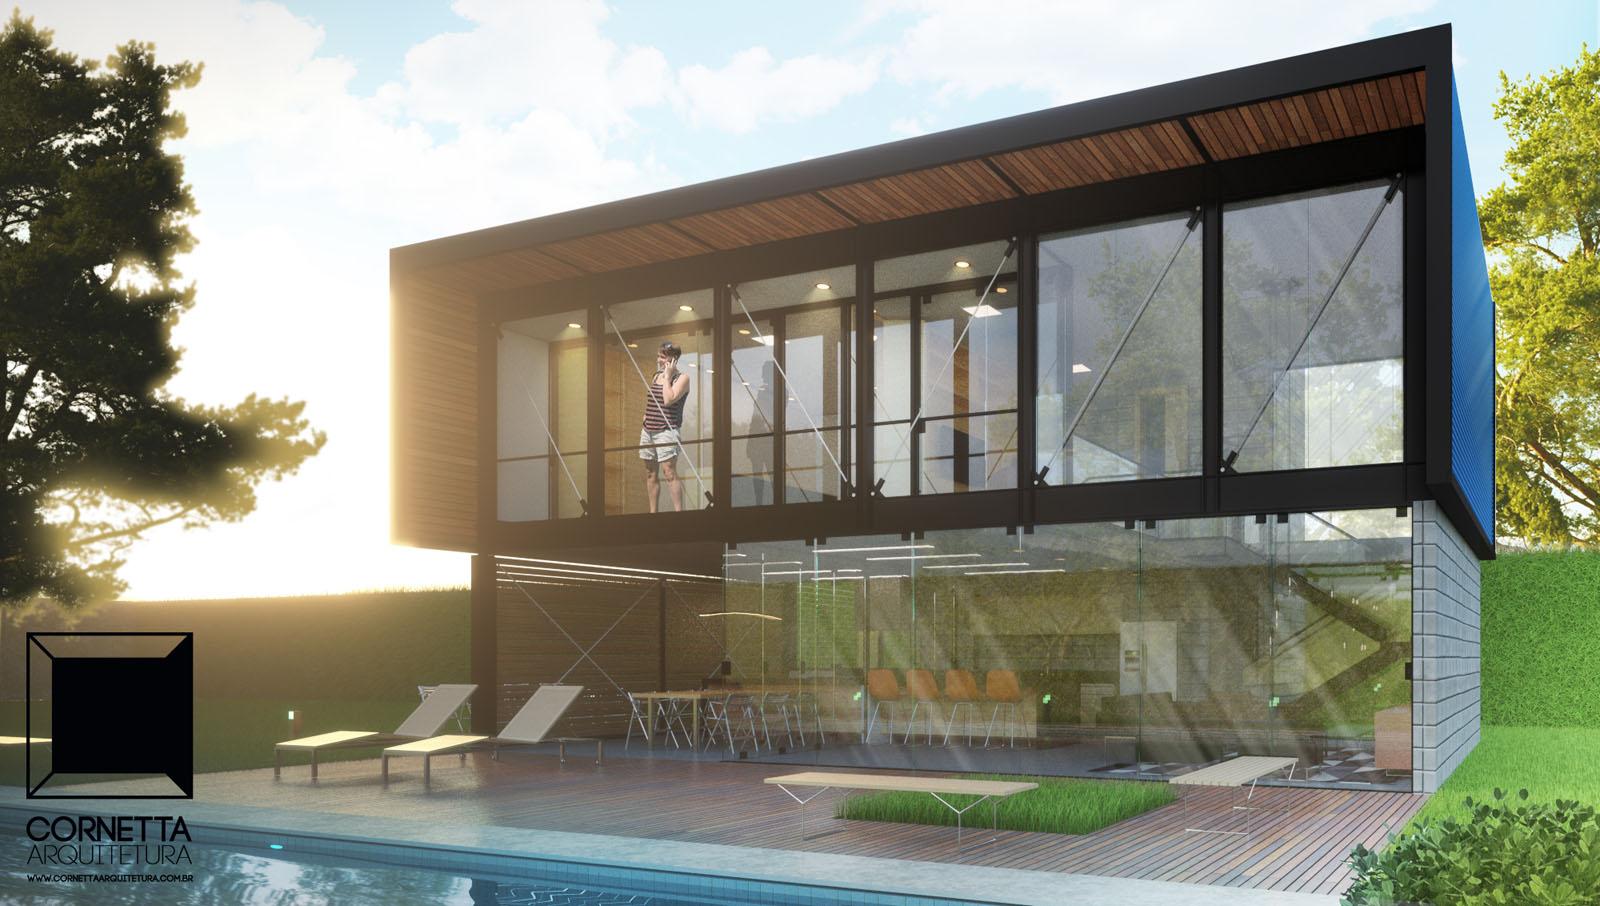 loft pf cornetta arquitetura. Black Bedroom Furniture Sets. Home Design Ideas